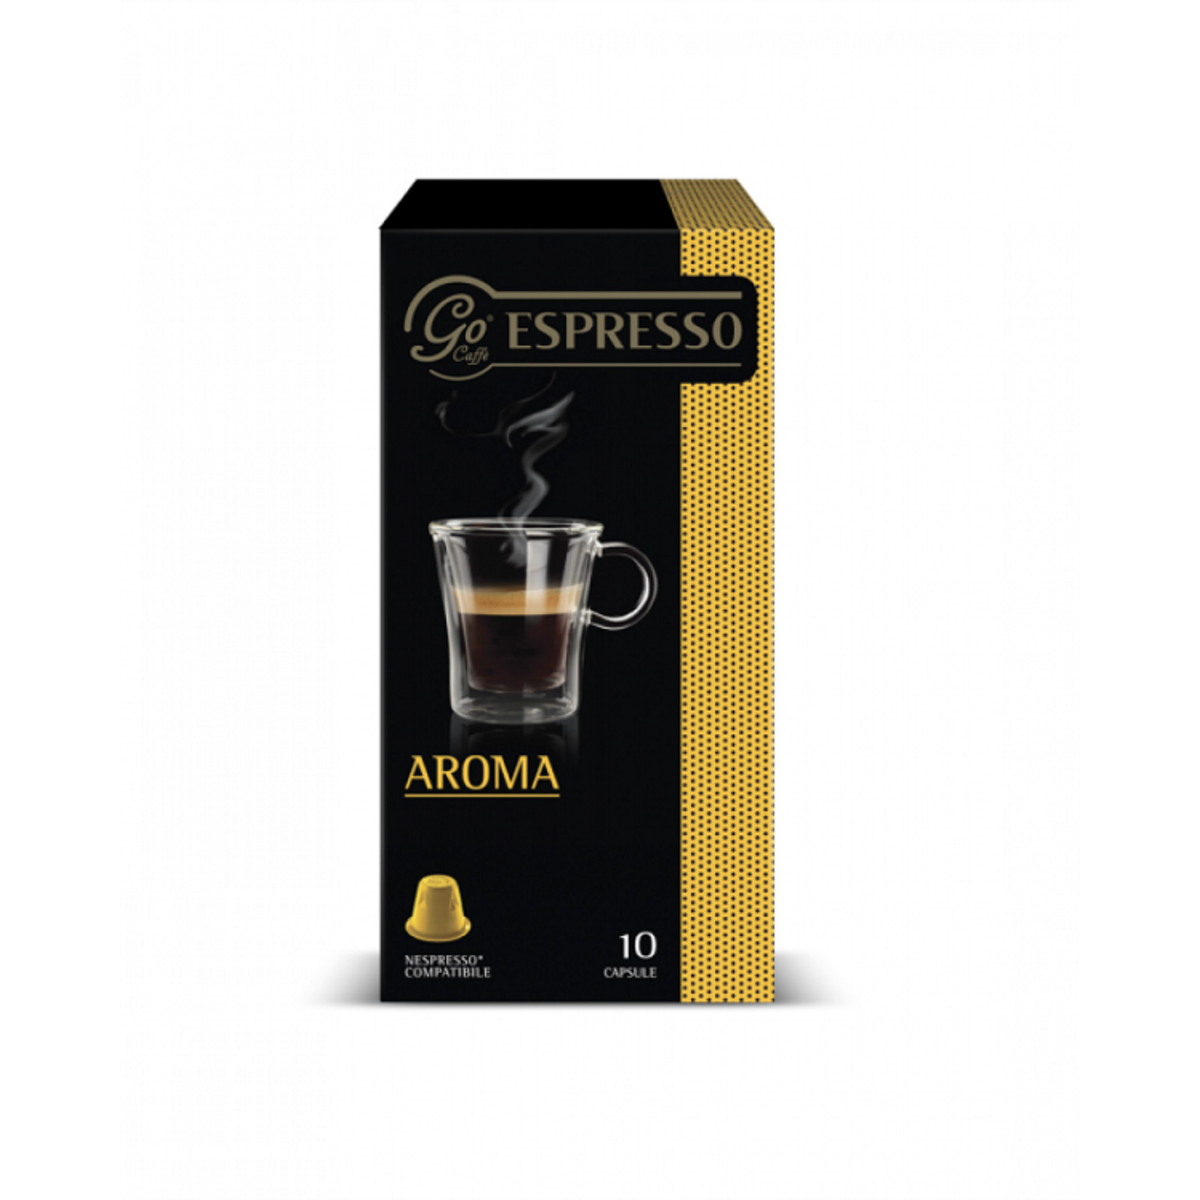 Go Caffe Aroma - Nespresso съвместими капсули